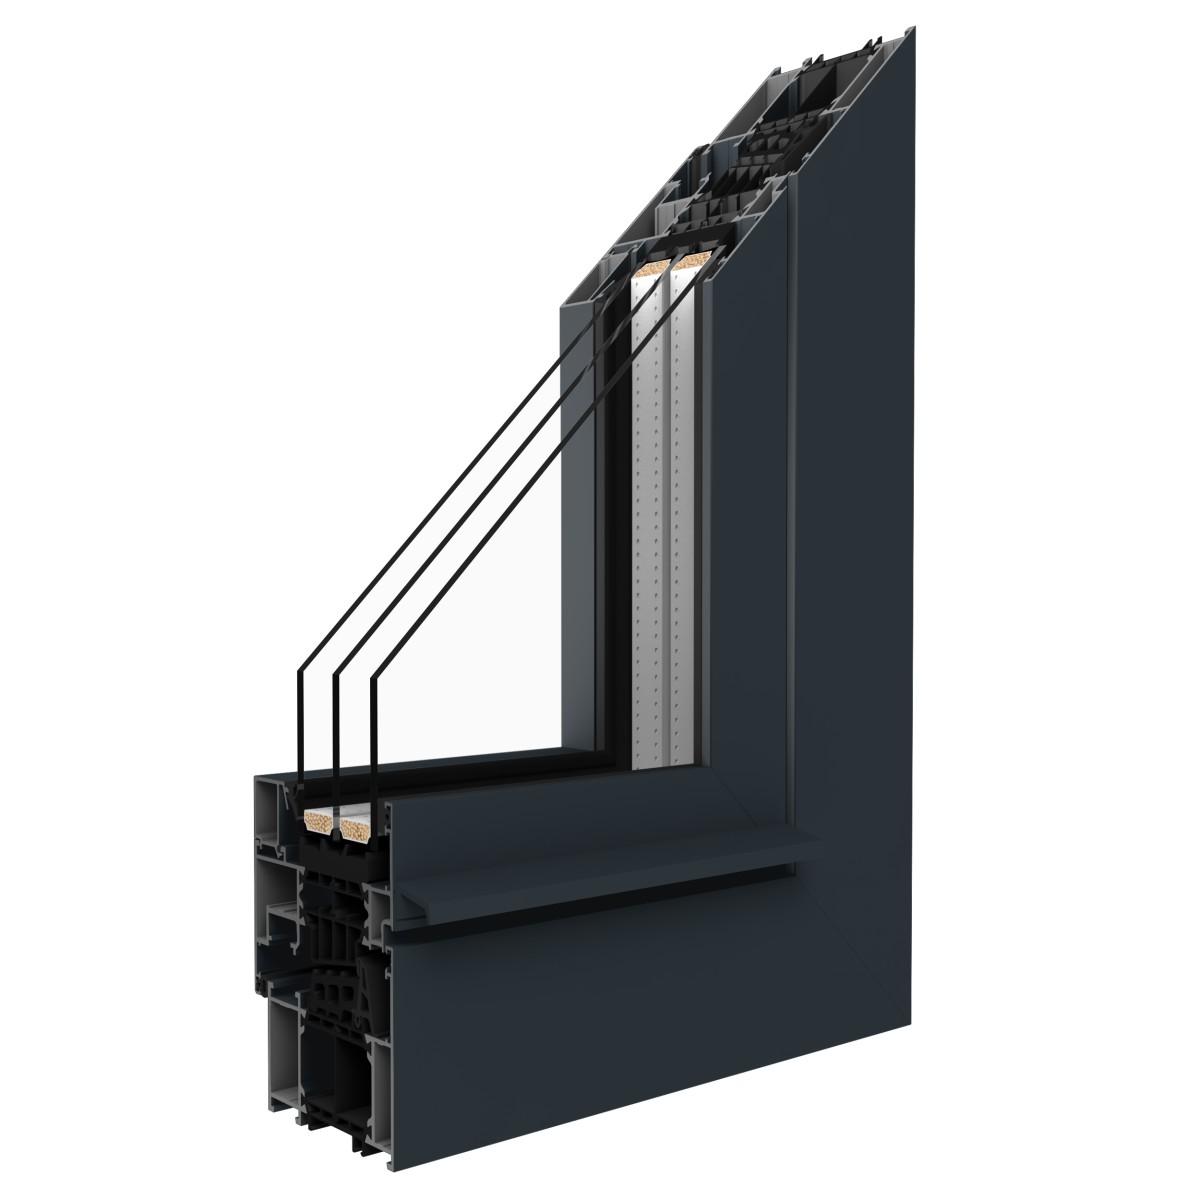 Aluminiumfenster- unt -türen MB 86si kaufen